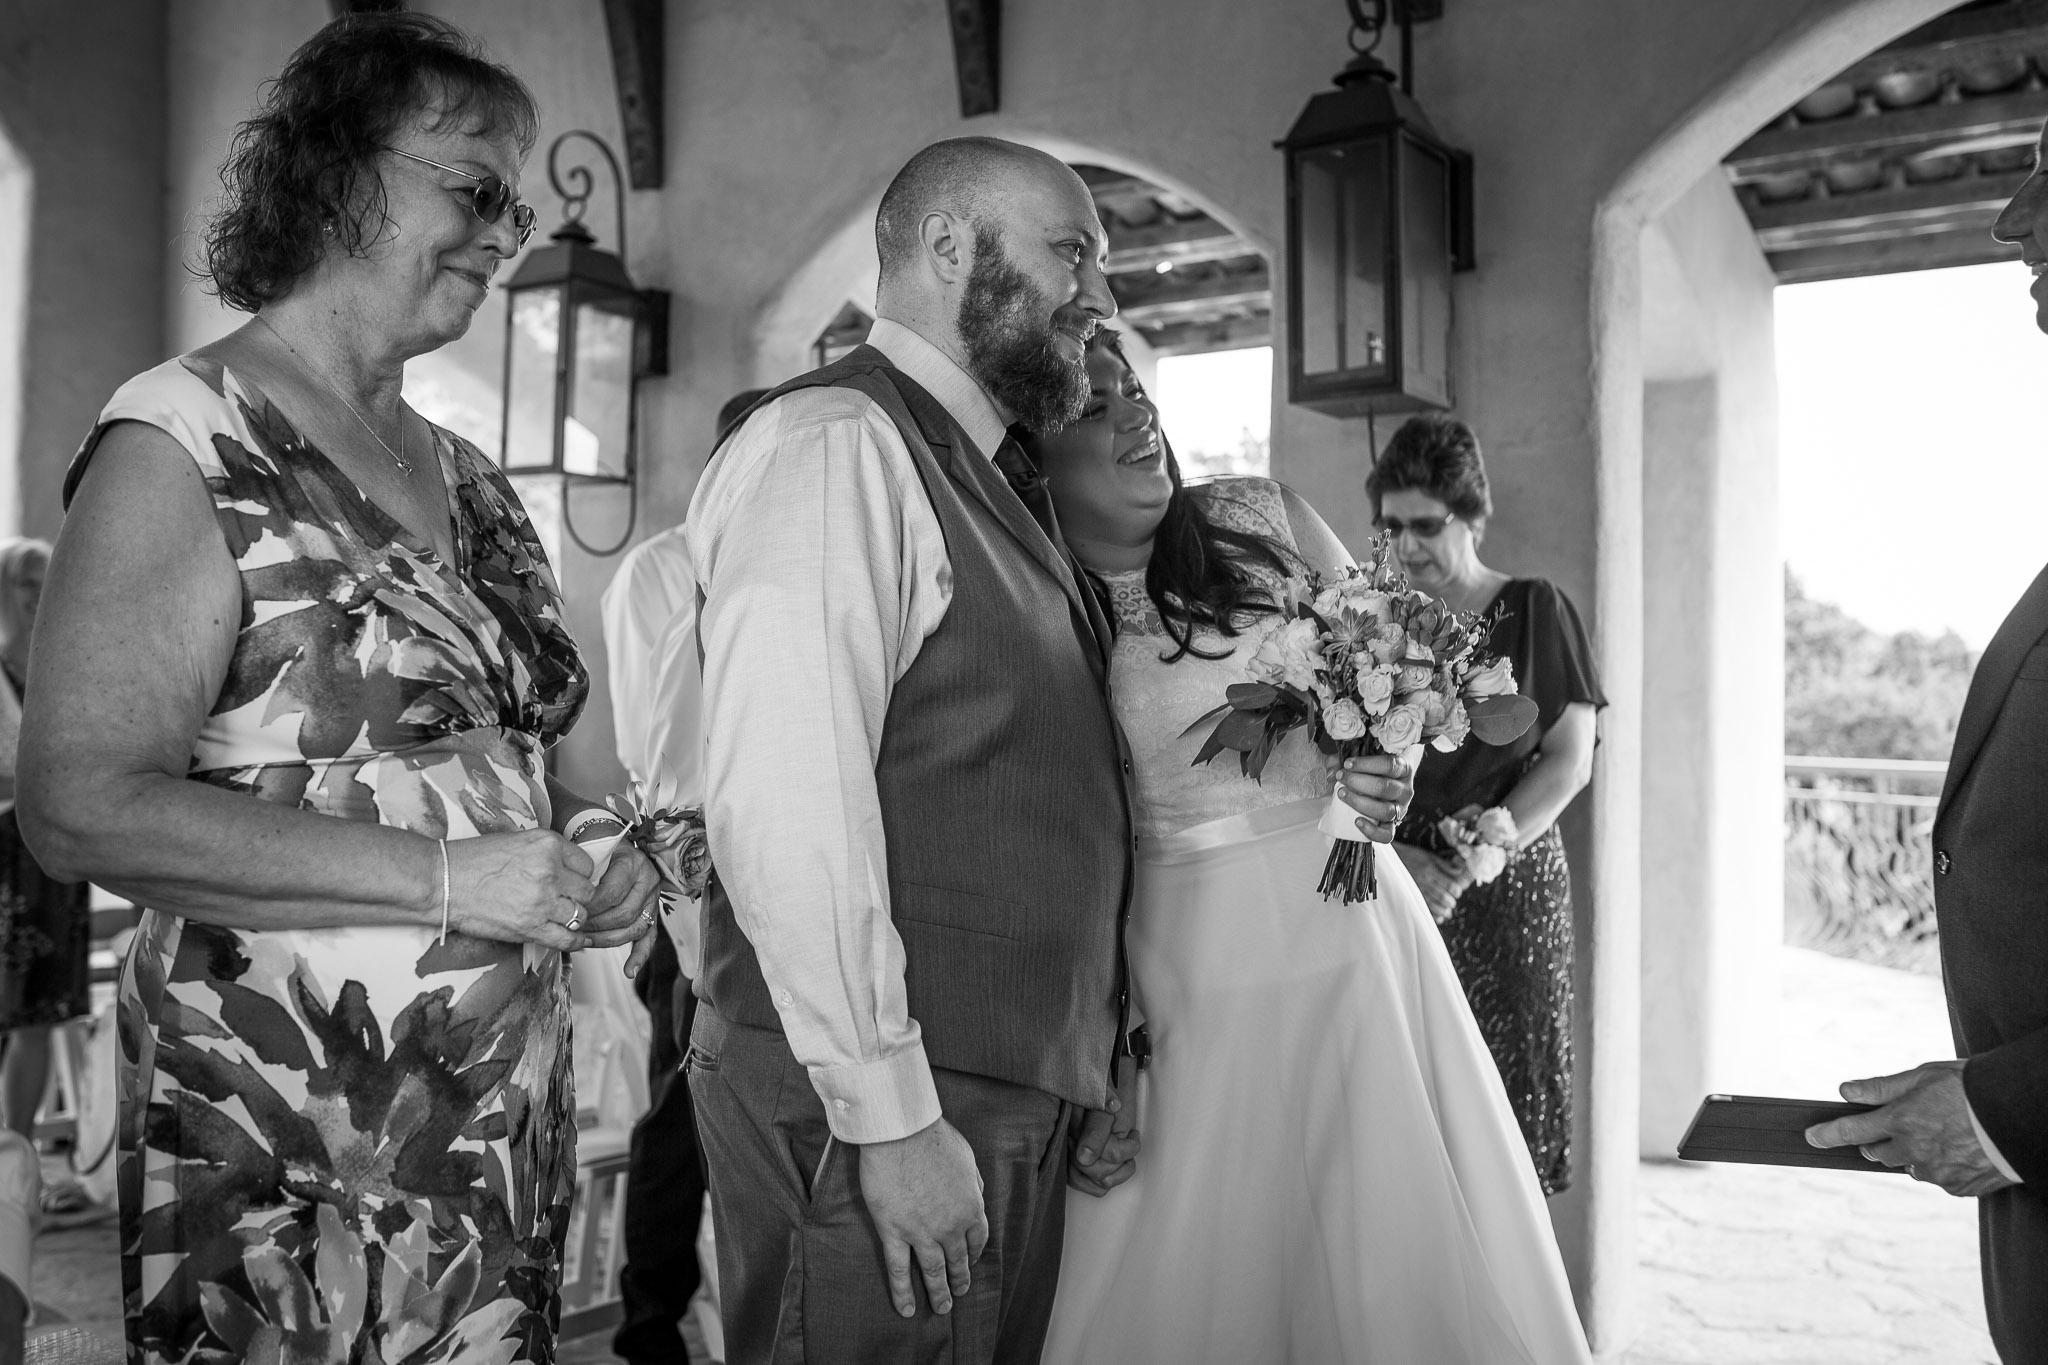 Groom hugging his bride while mom walks down aisle.